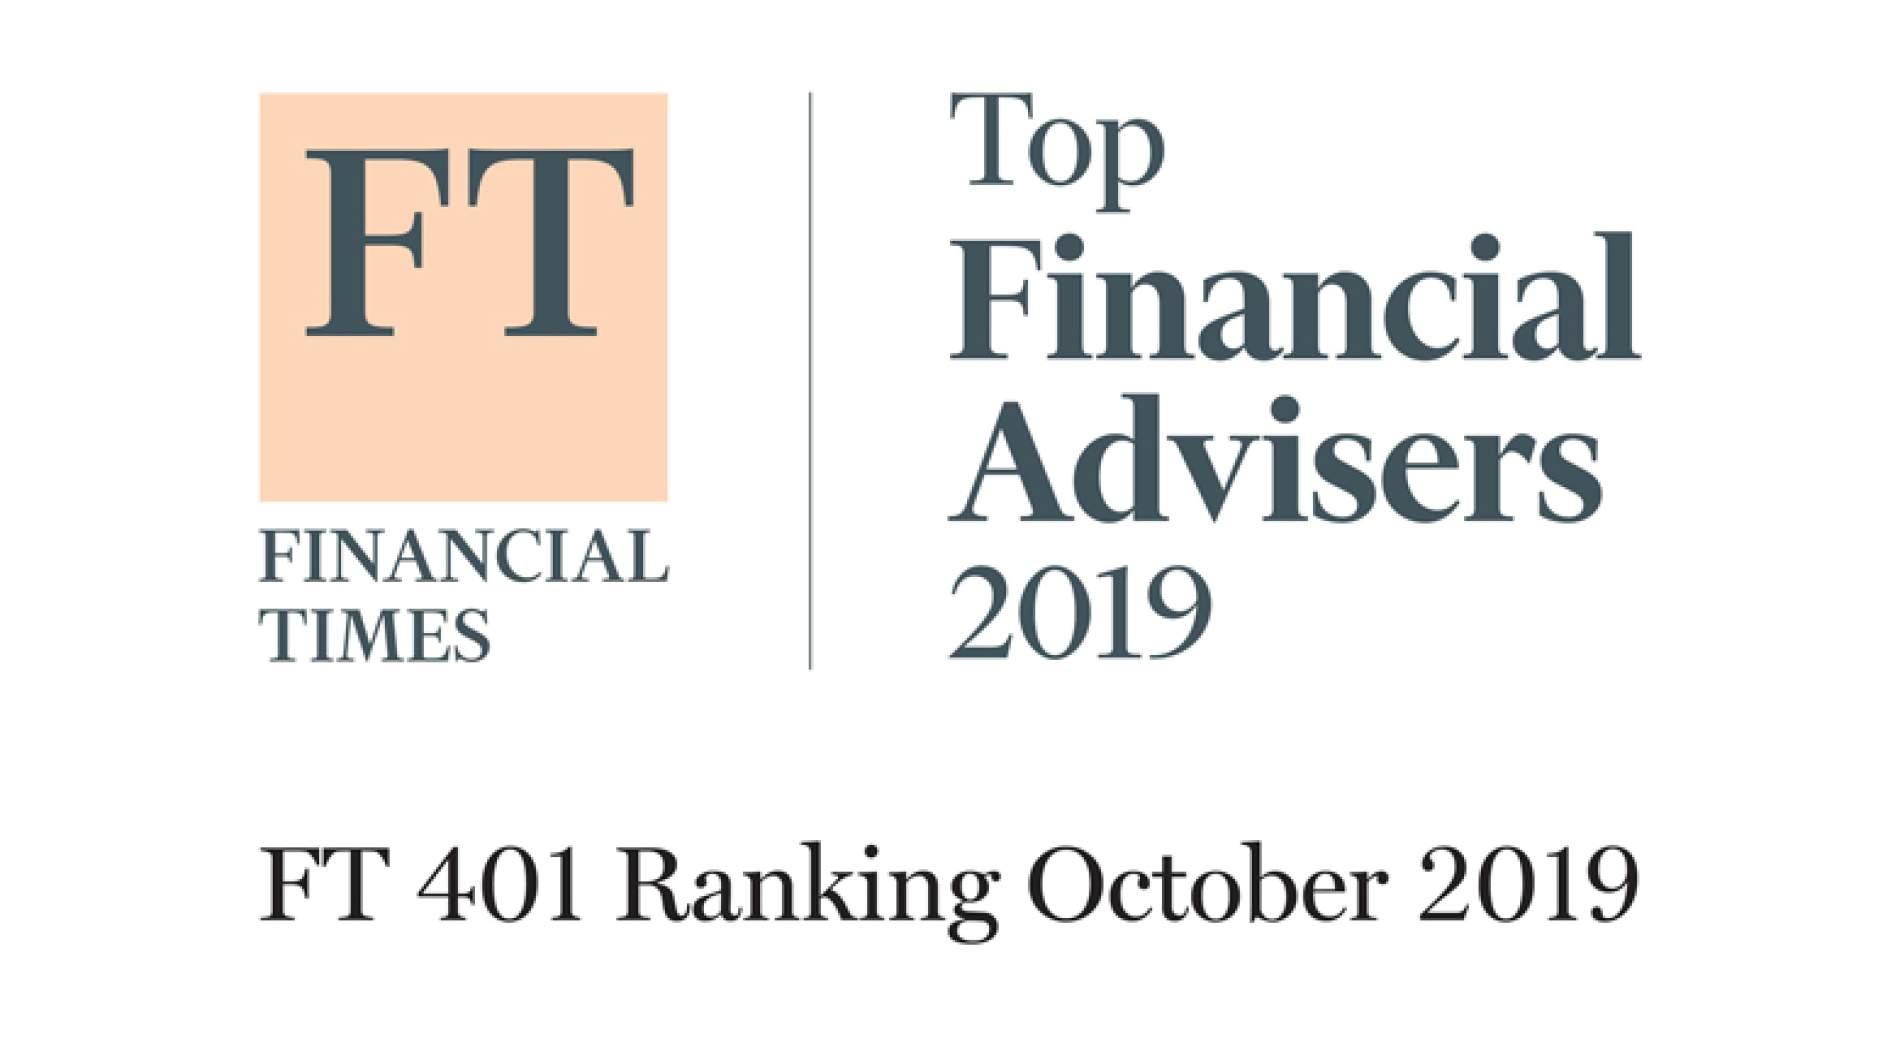 Top Retirement Advisers